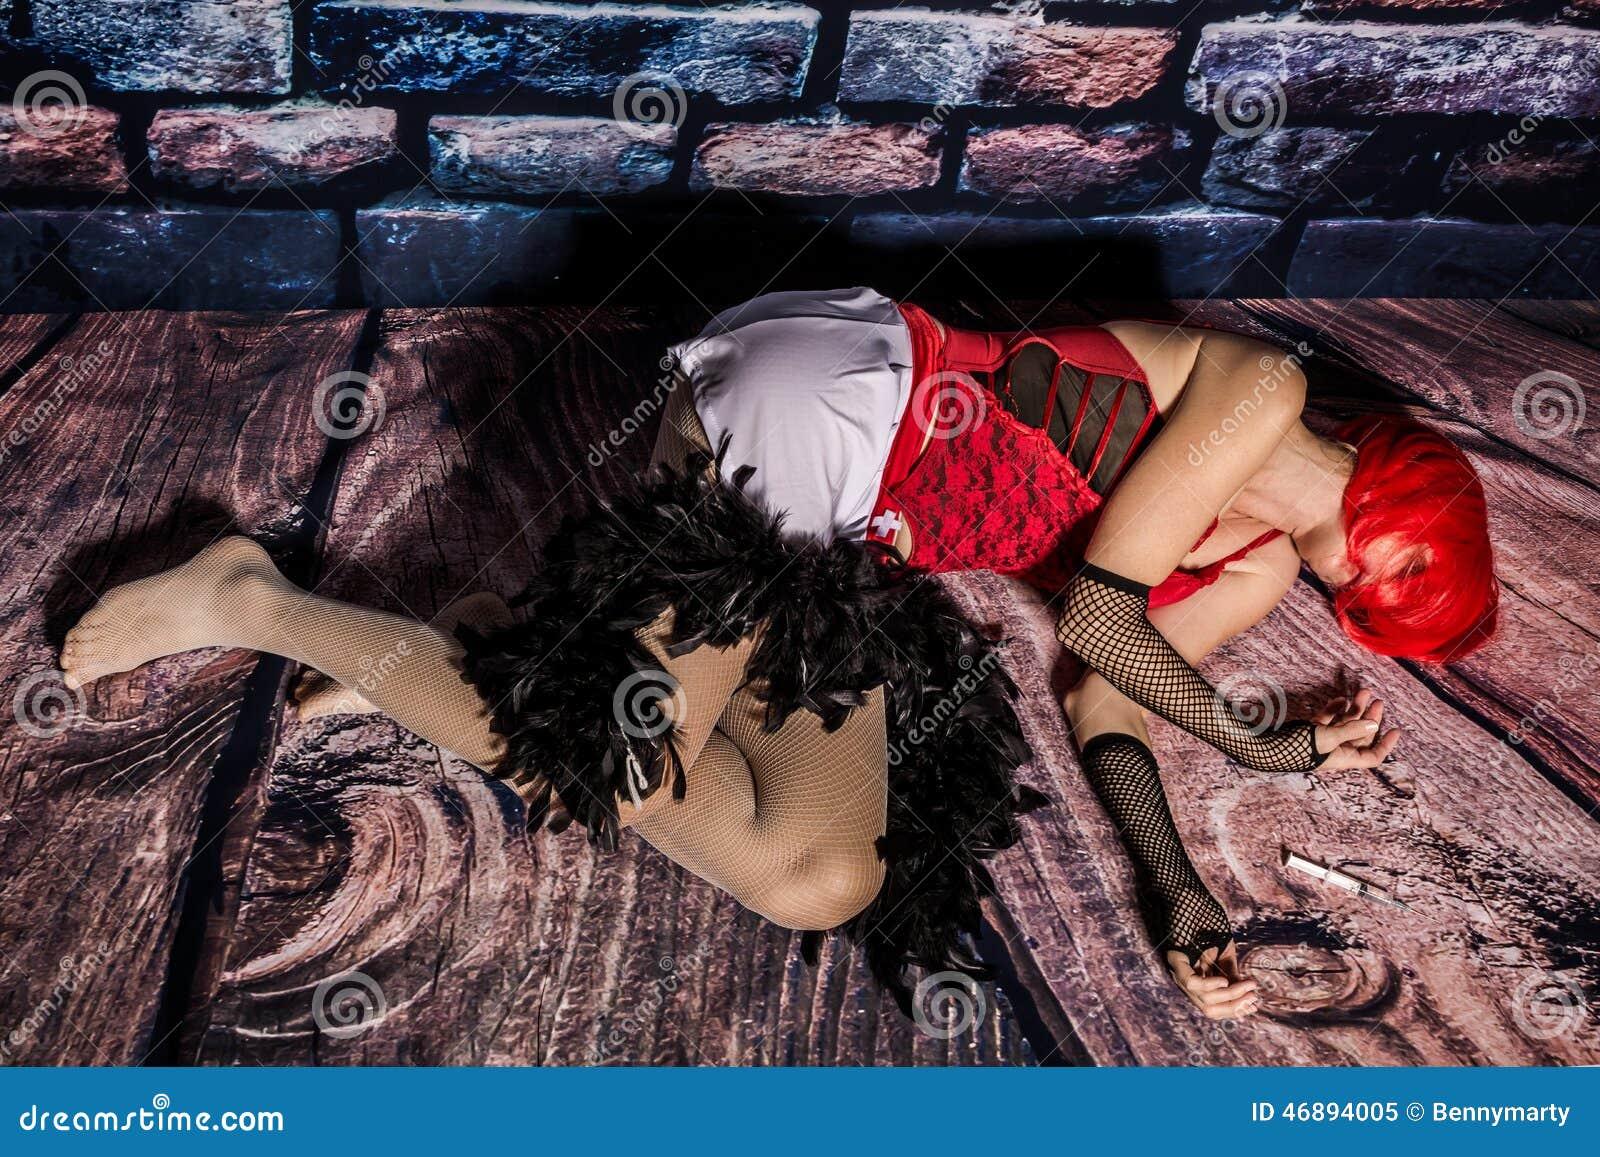 Syringe on street girl 5 jeringa en la calle a jovencita 5 - 3 part 4